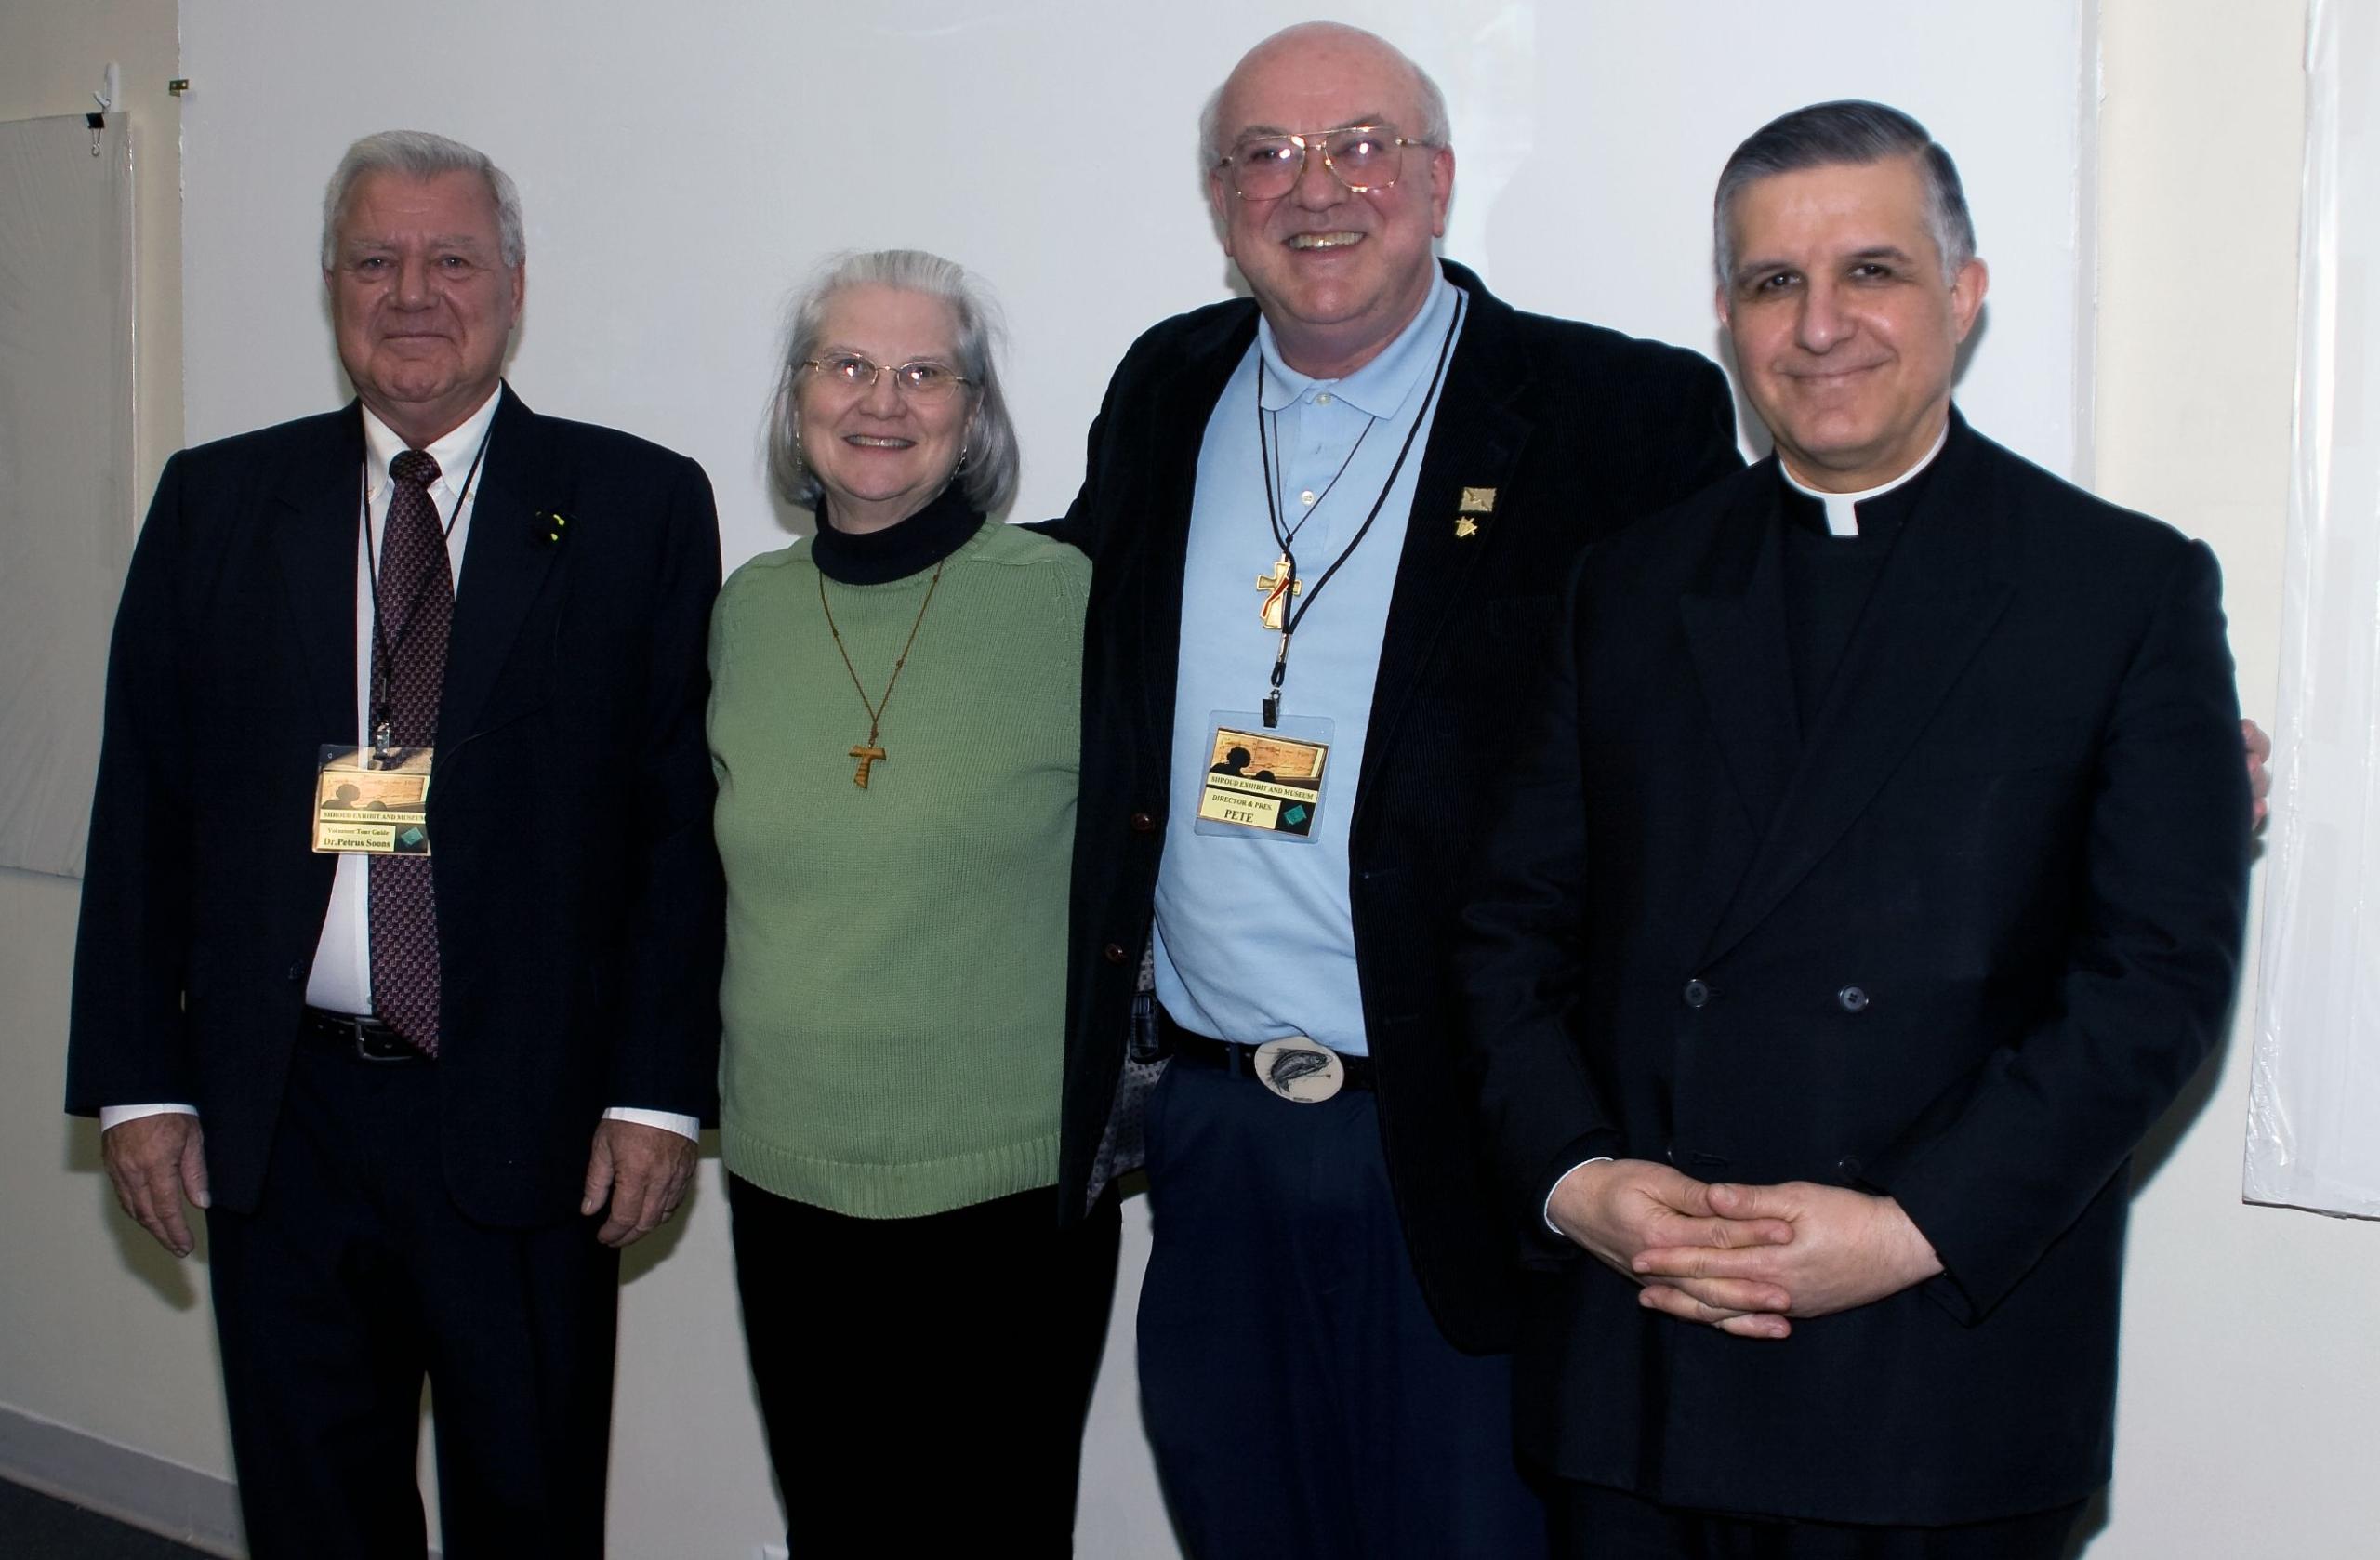 Foto 4 - Visit to Pete and Susan Schumacher